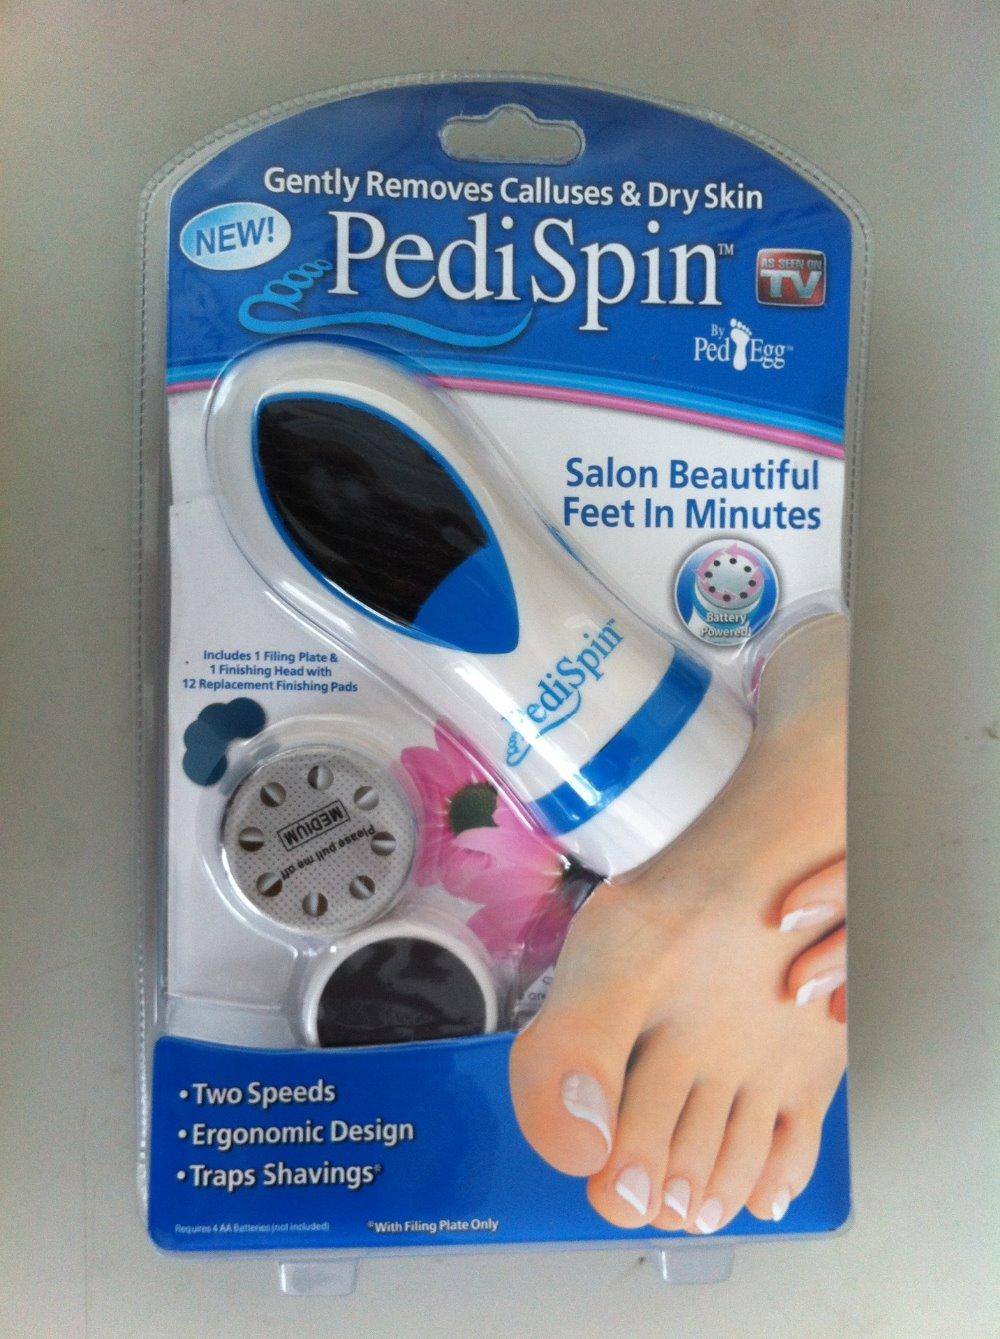 foot care tool velvet smooth express pedi diamond set electric pedicure machine foot file feet care pedicura skin callus remover(China (Mainland))